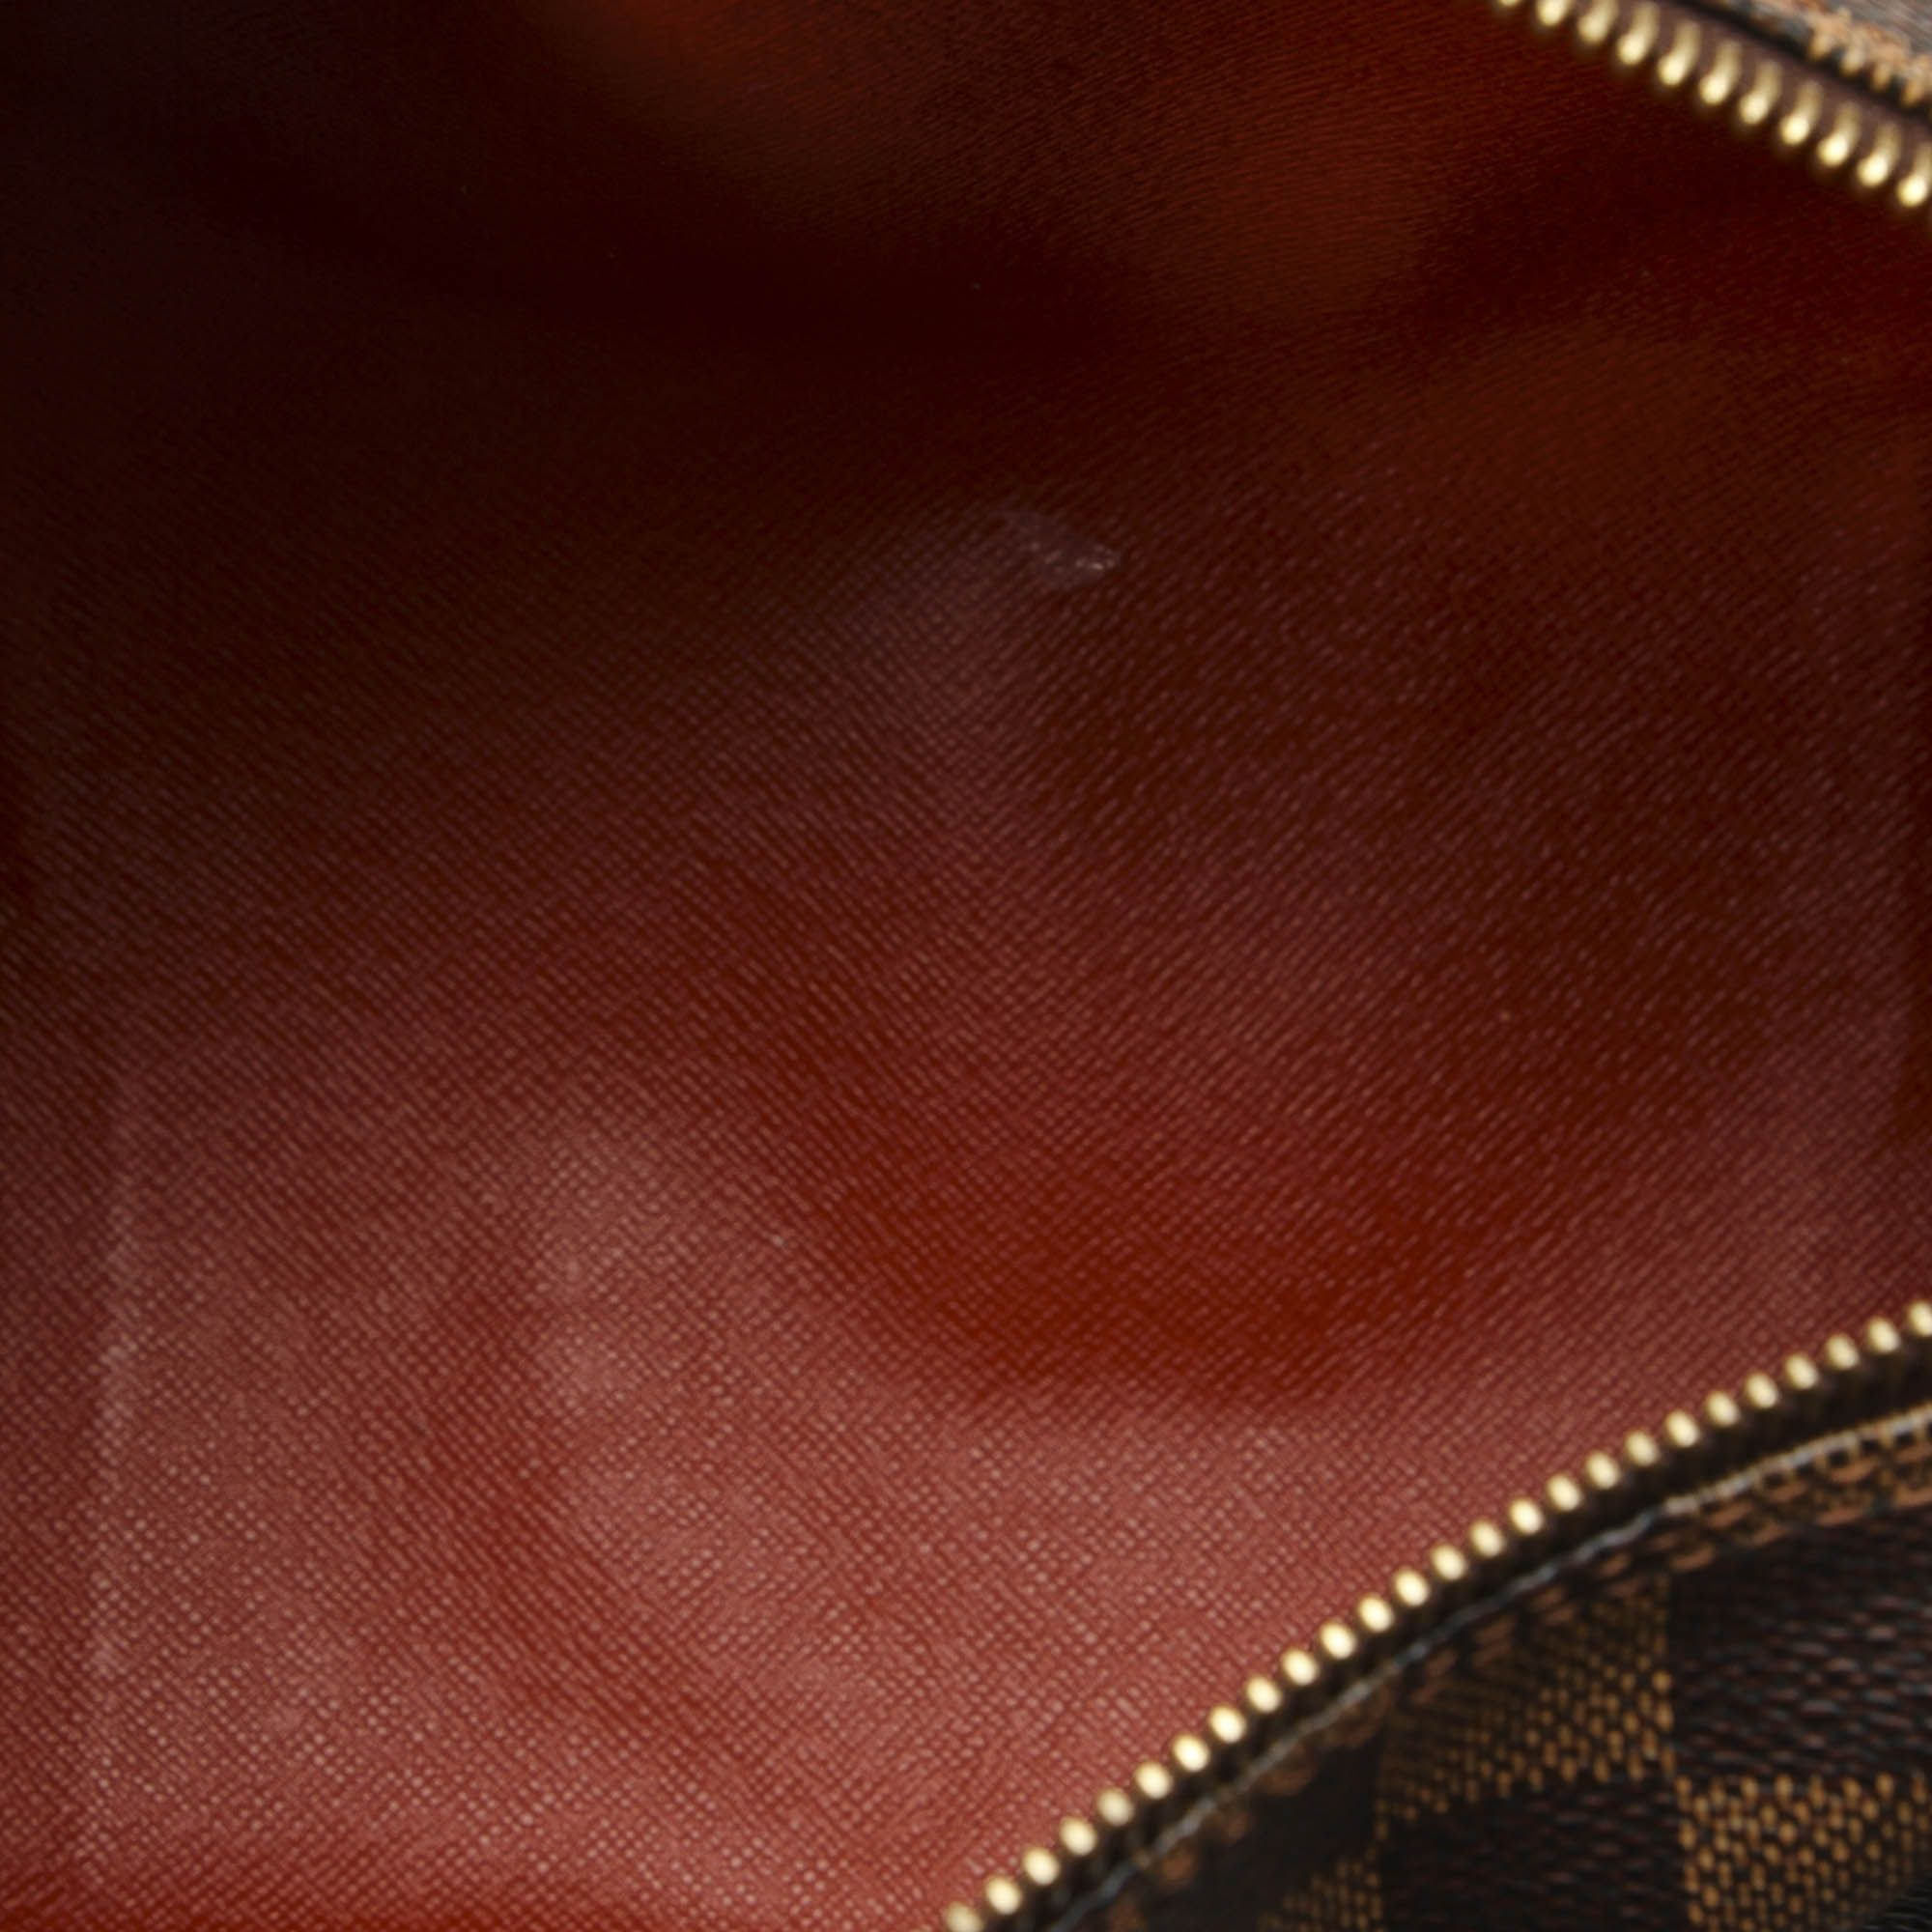 Vintage Louis Vuitton Damier Ebene Papillon 30 Brown